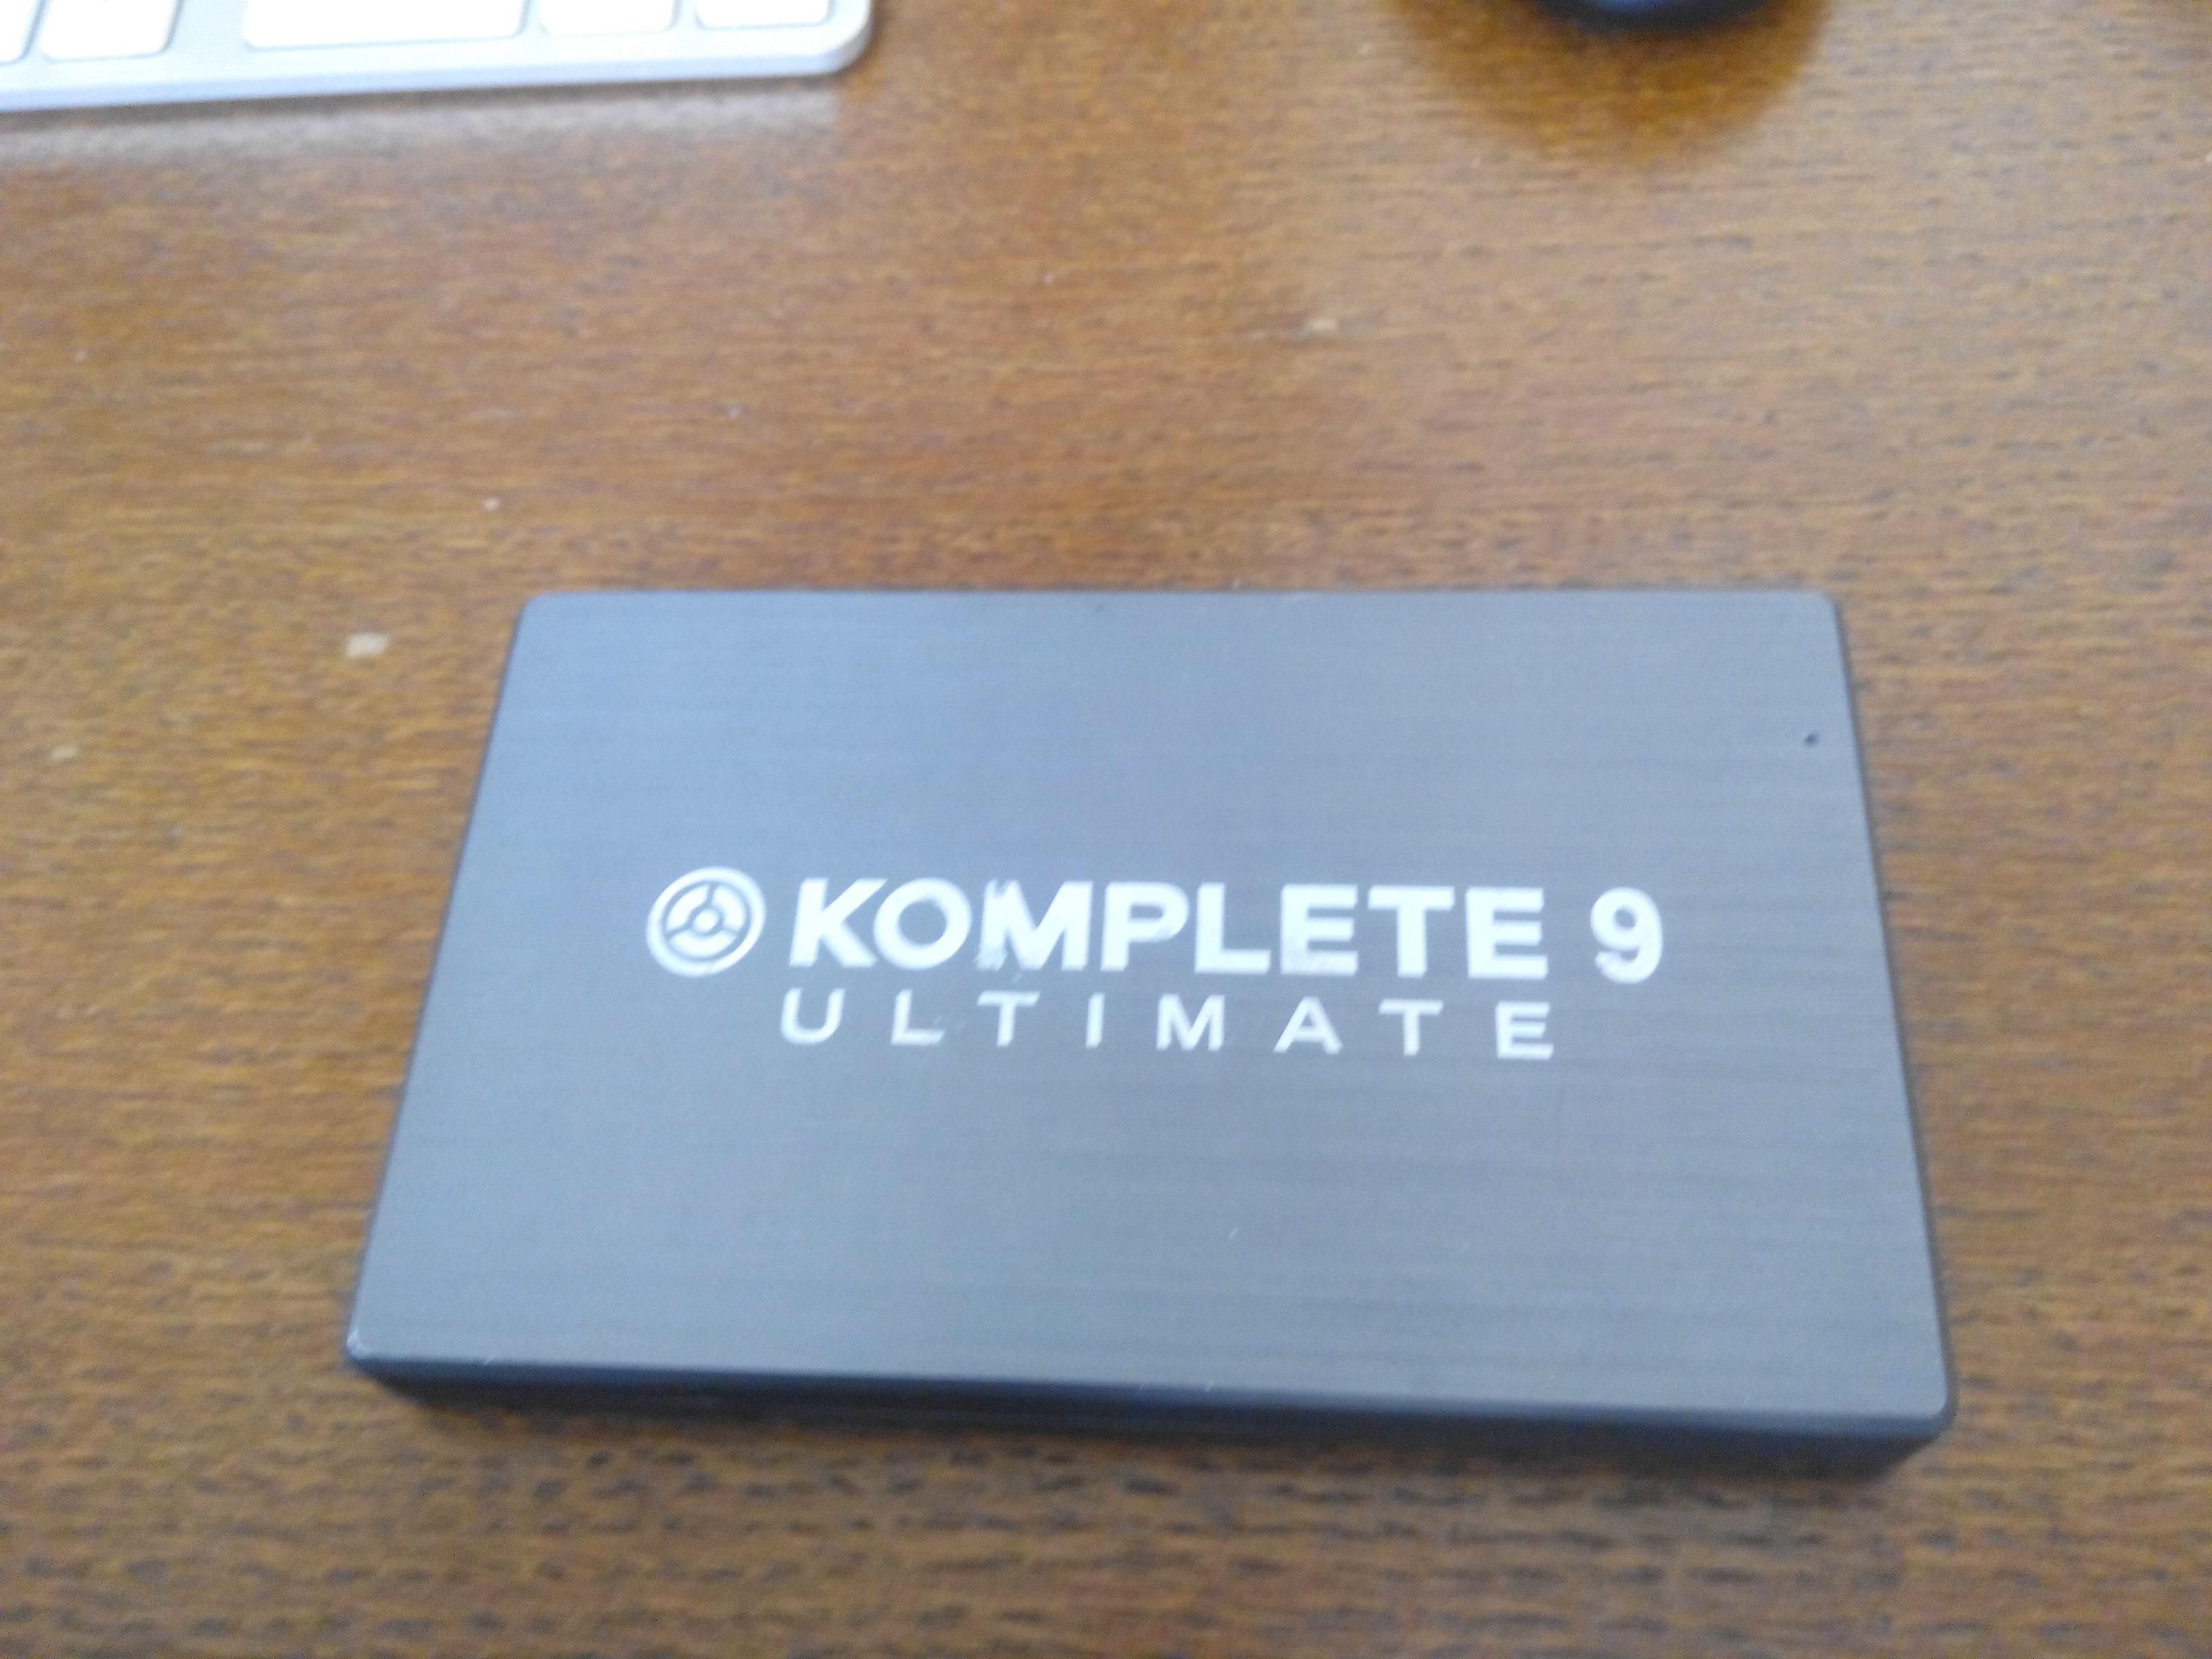 KOMPLETE 9 Free Download for Windows 10, 7, 8/8.1 (64 bit ...